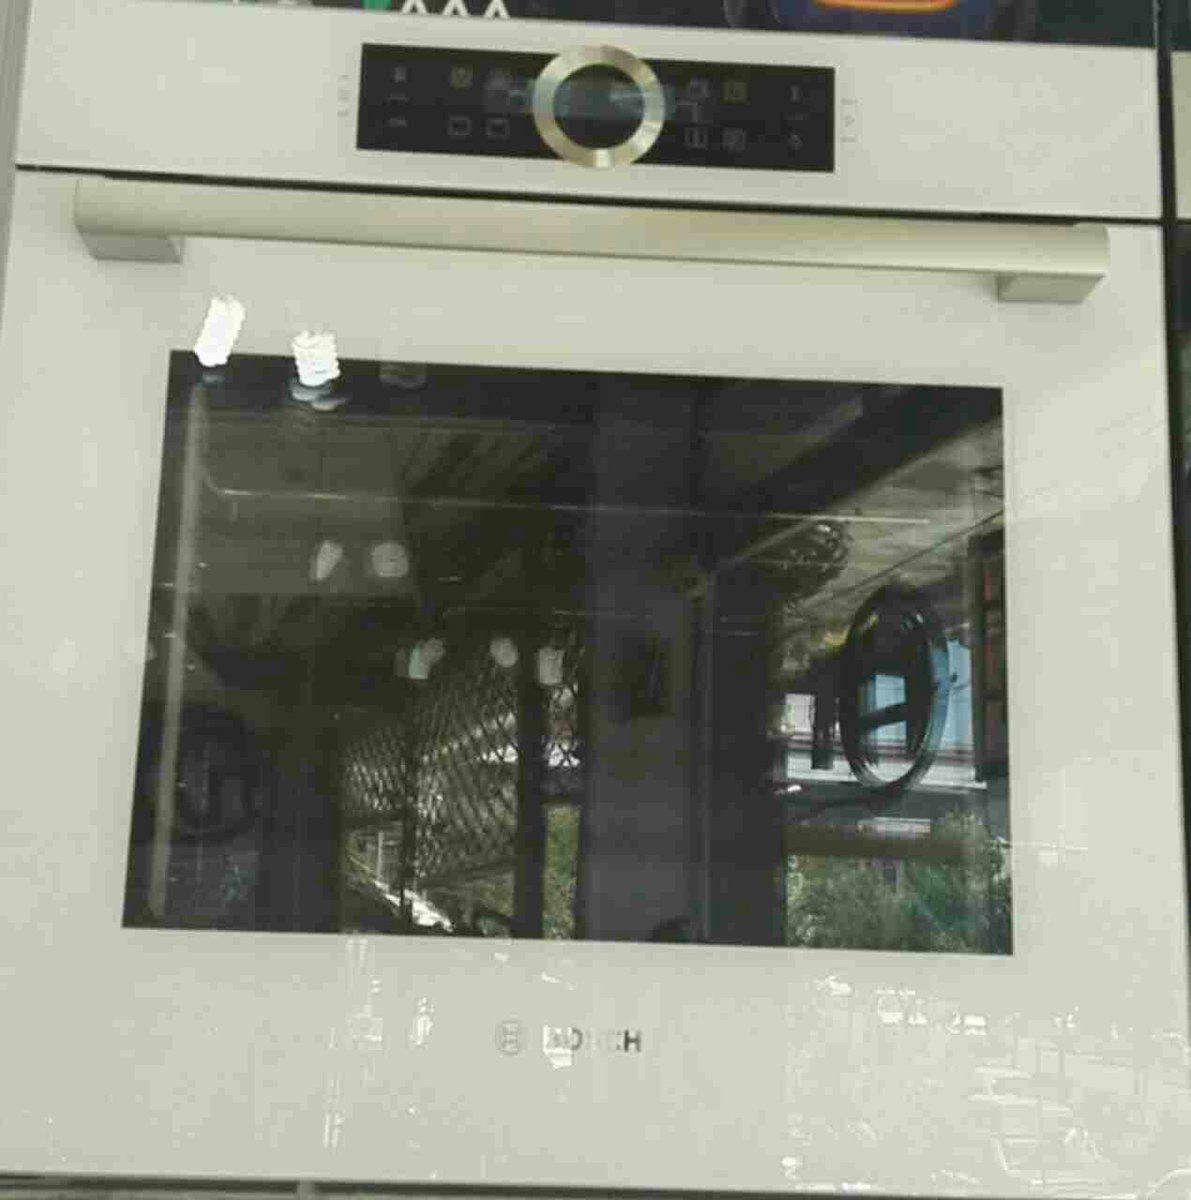 Solardom Microwave Bestmicrowave